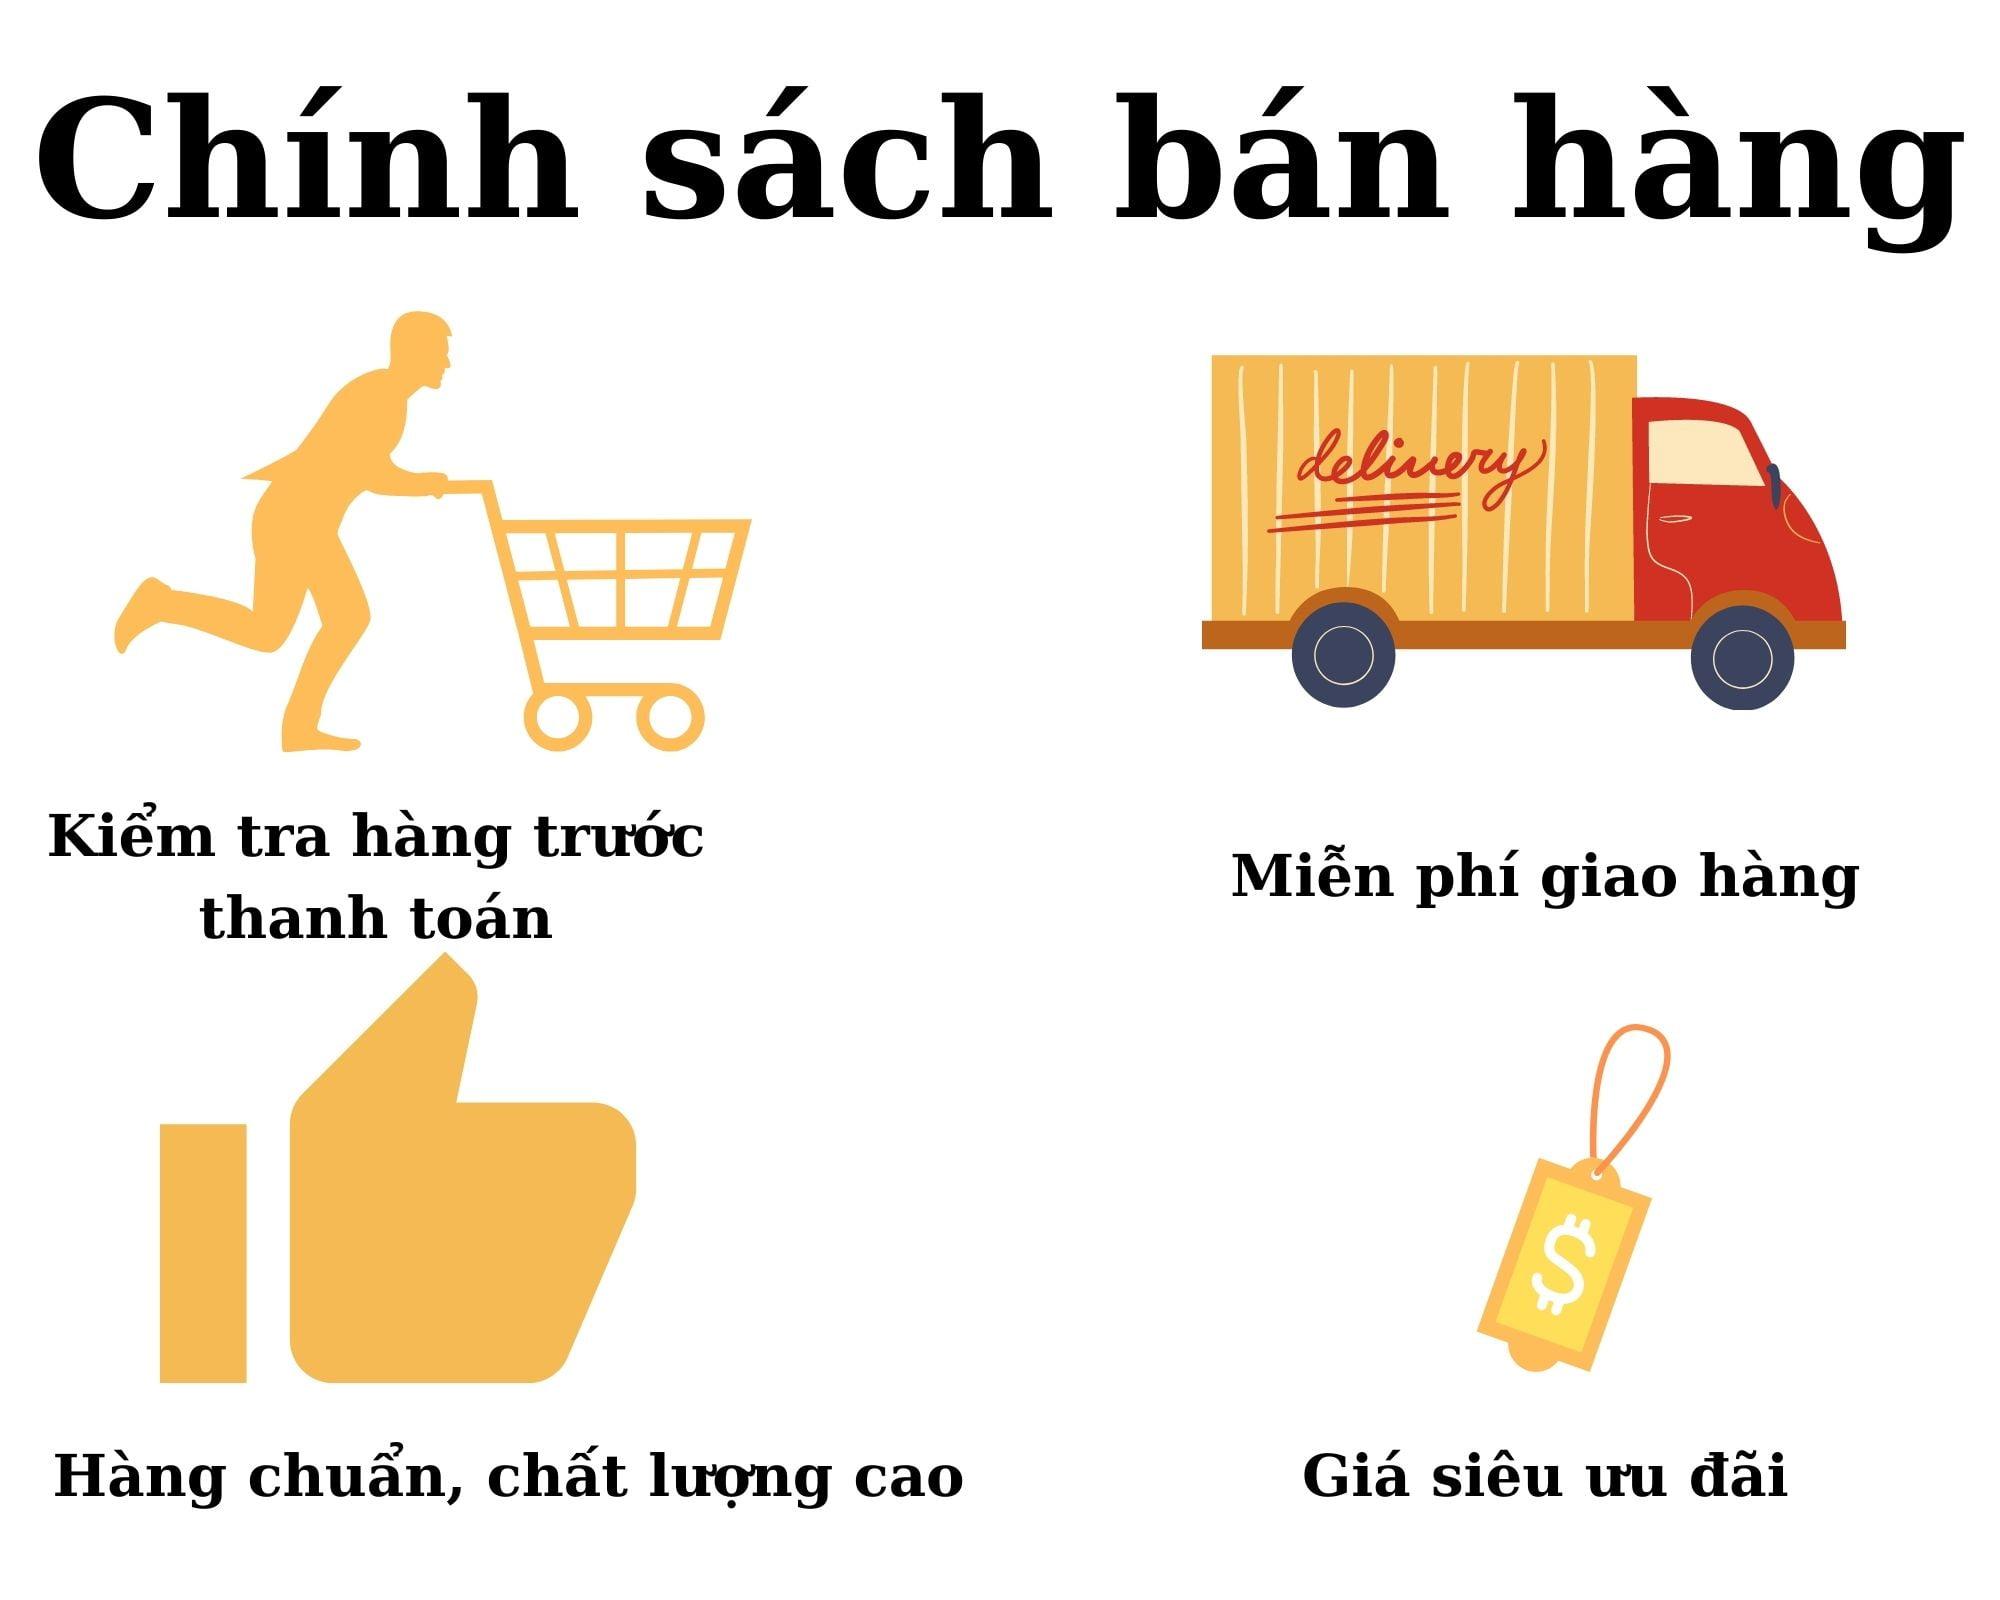 ke-gia-sach-bang-go-da-nang-GHC-2405-5 (2)